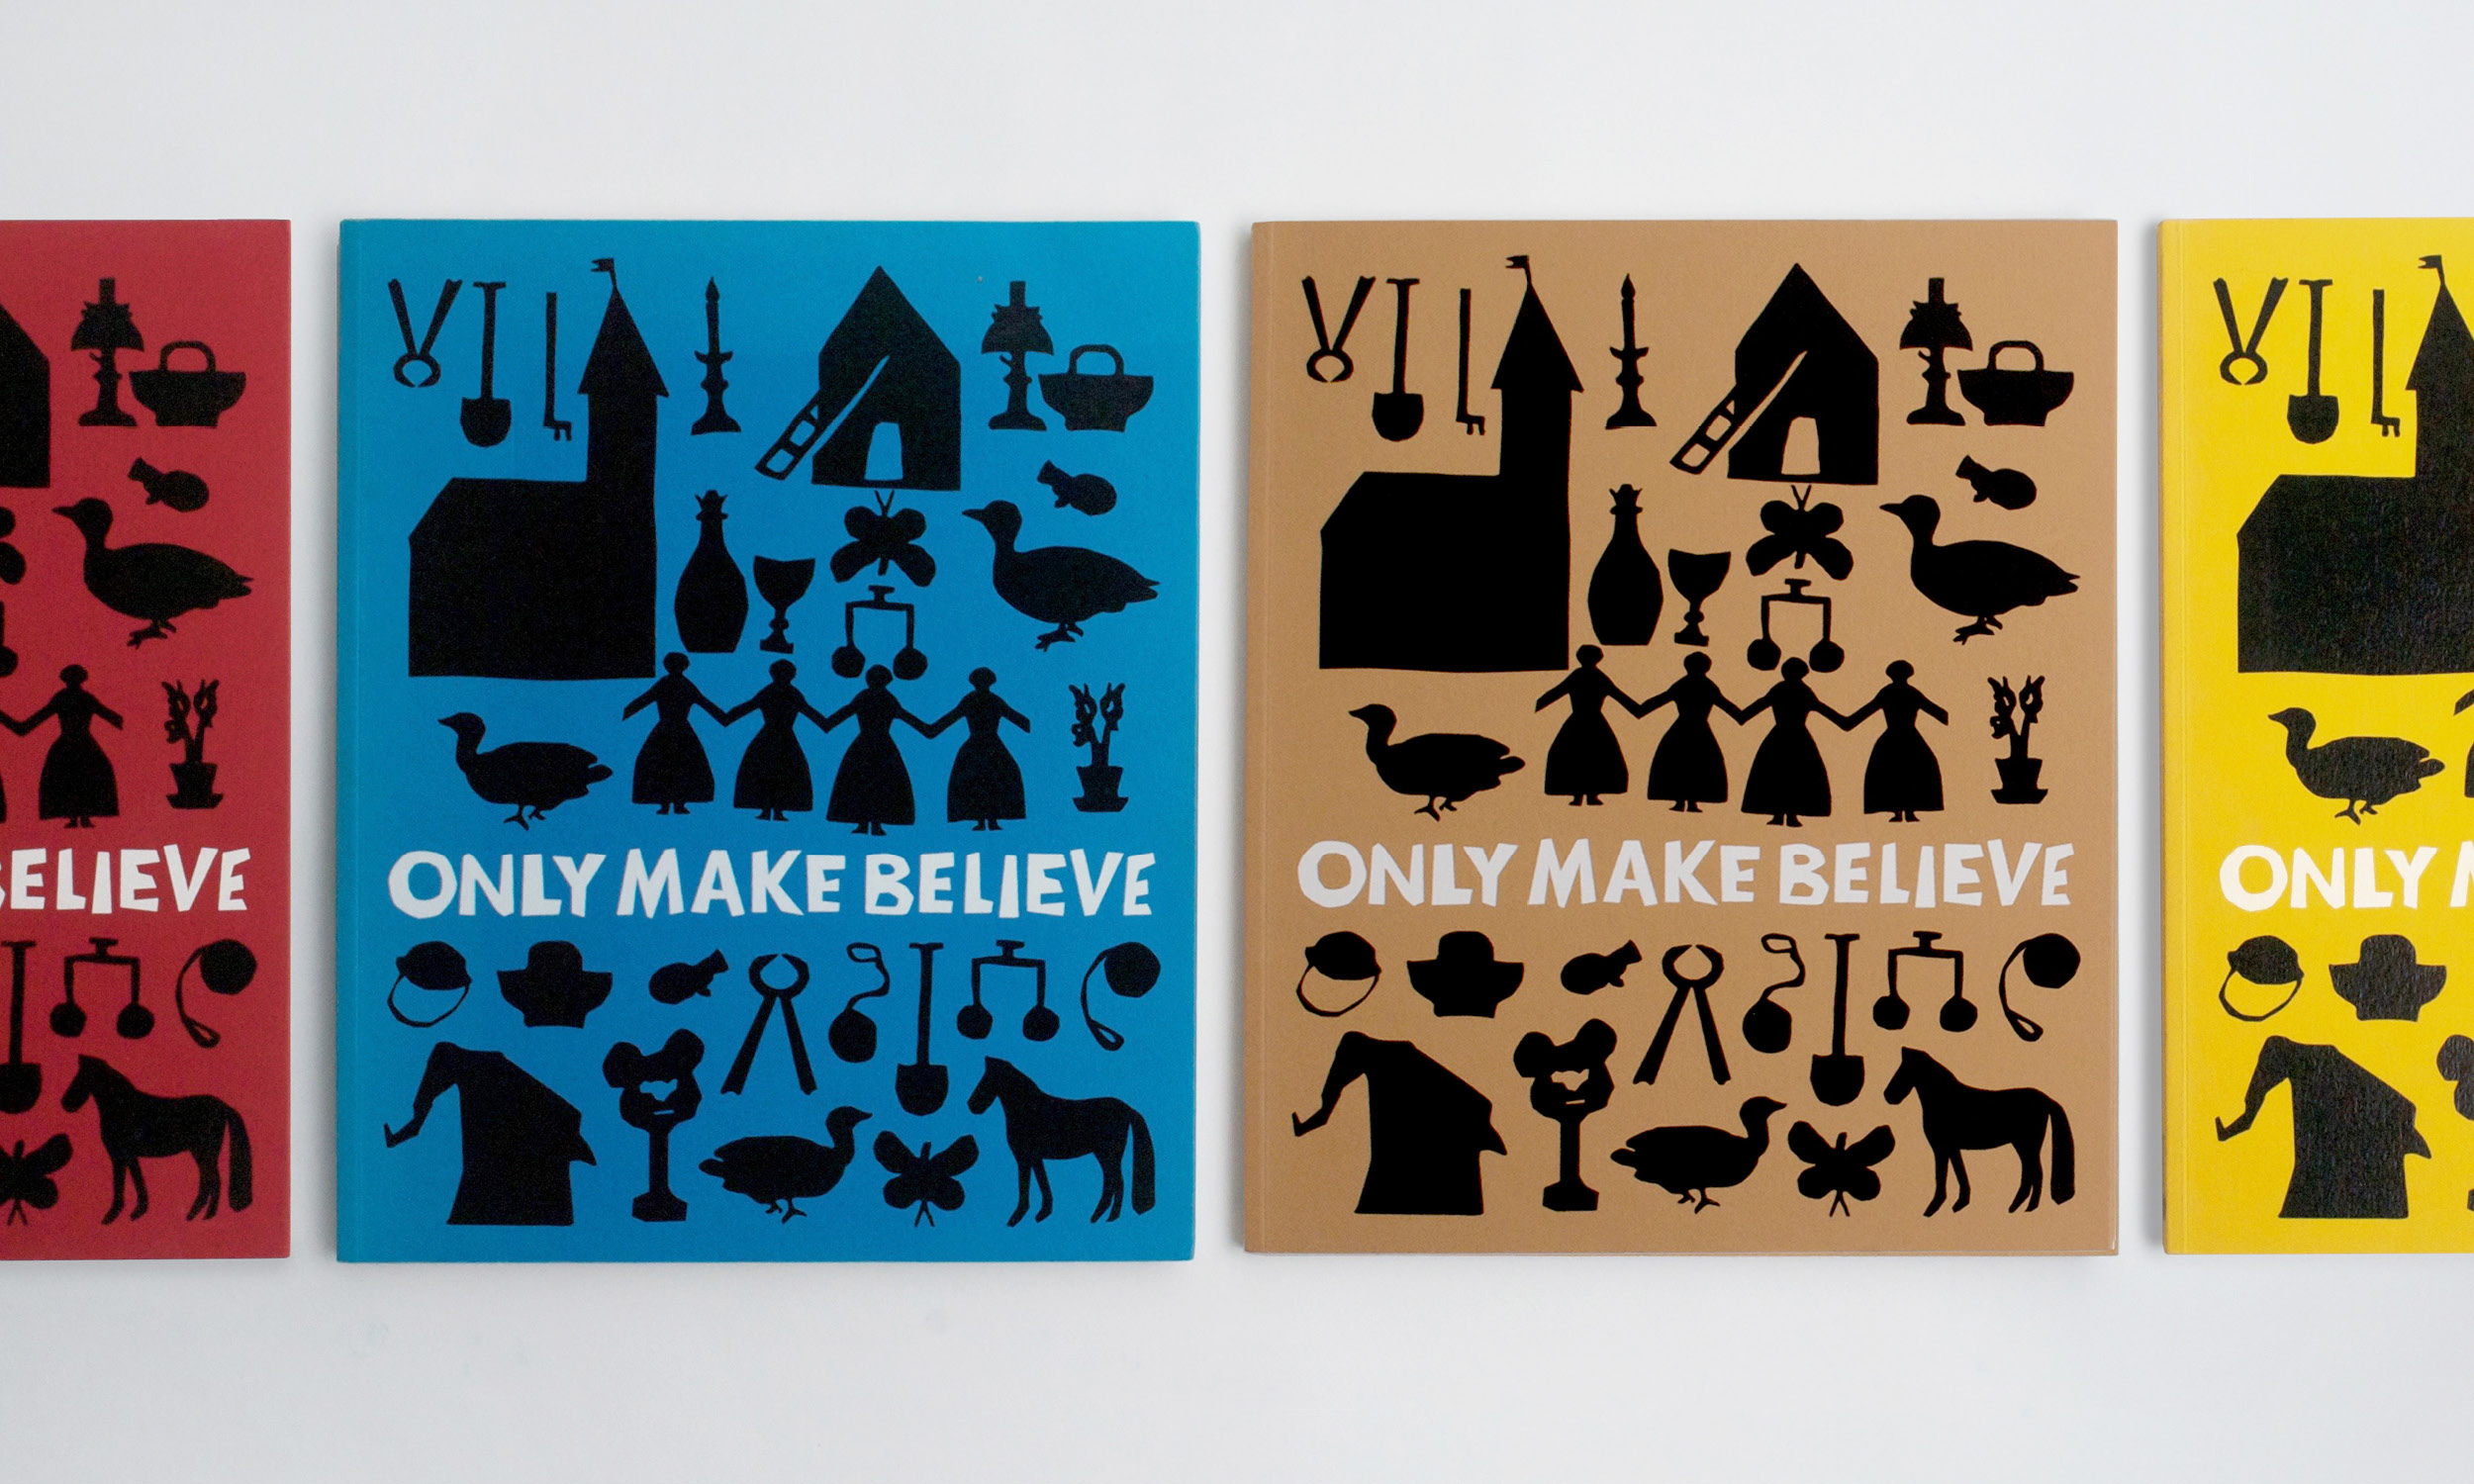 Only-make-believe-LR.jpg